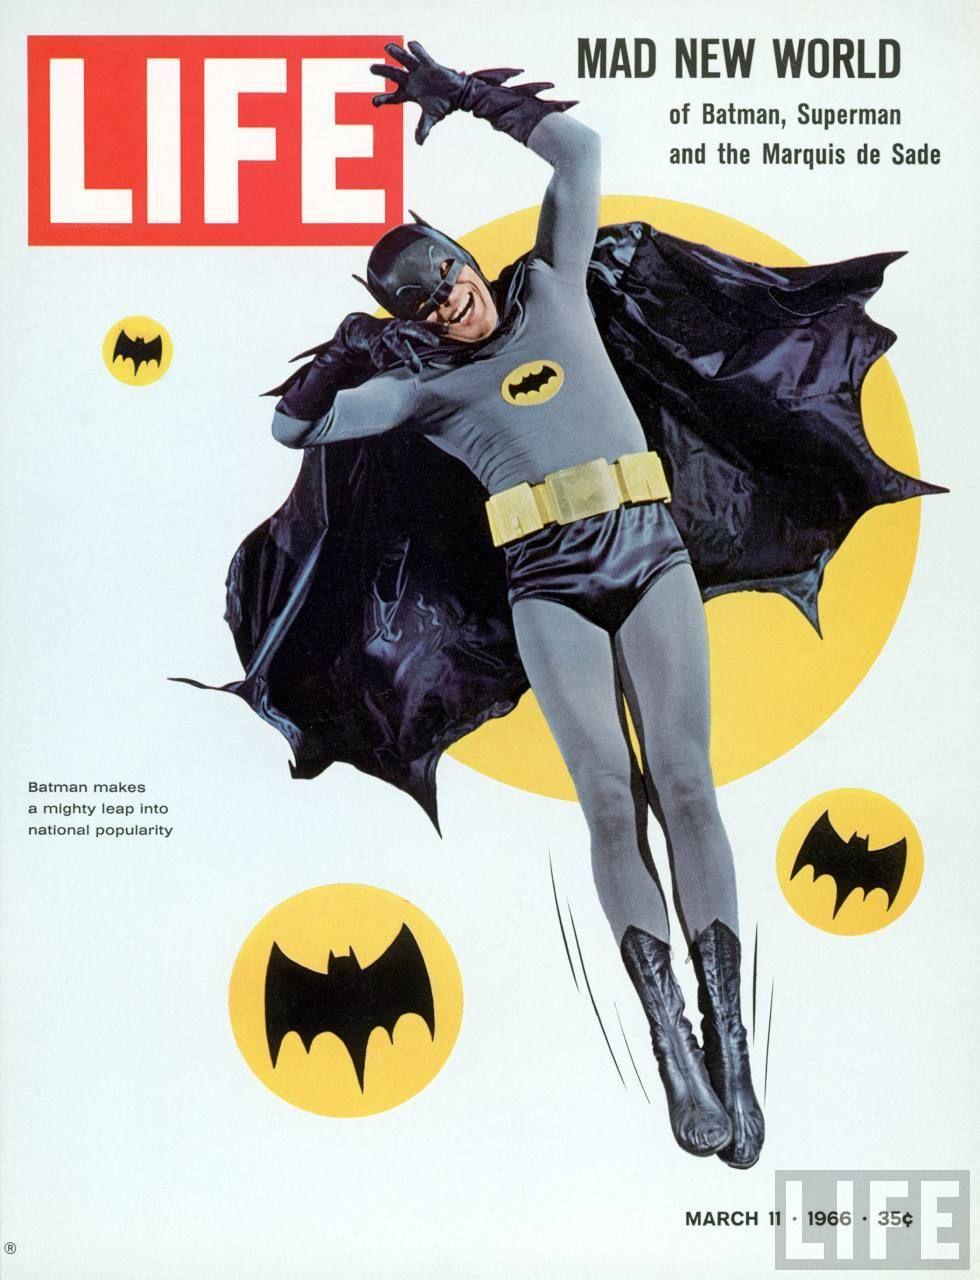 BATGIRL BATMAN 1960/'S TV SHOW  YVONNE CRAIG   PRINT 18X24 POSTER